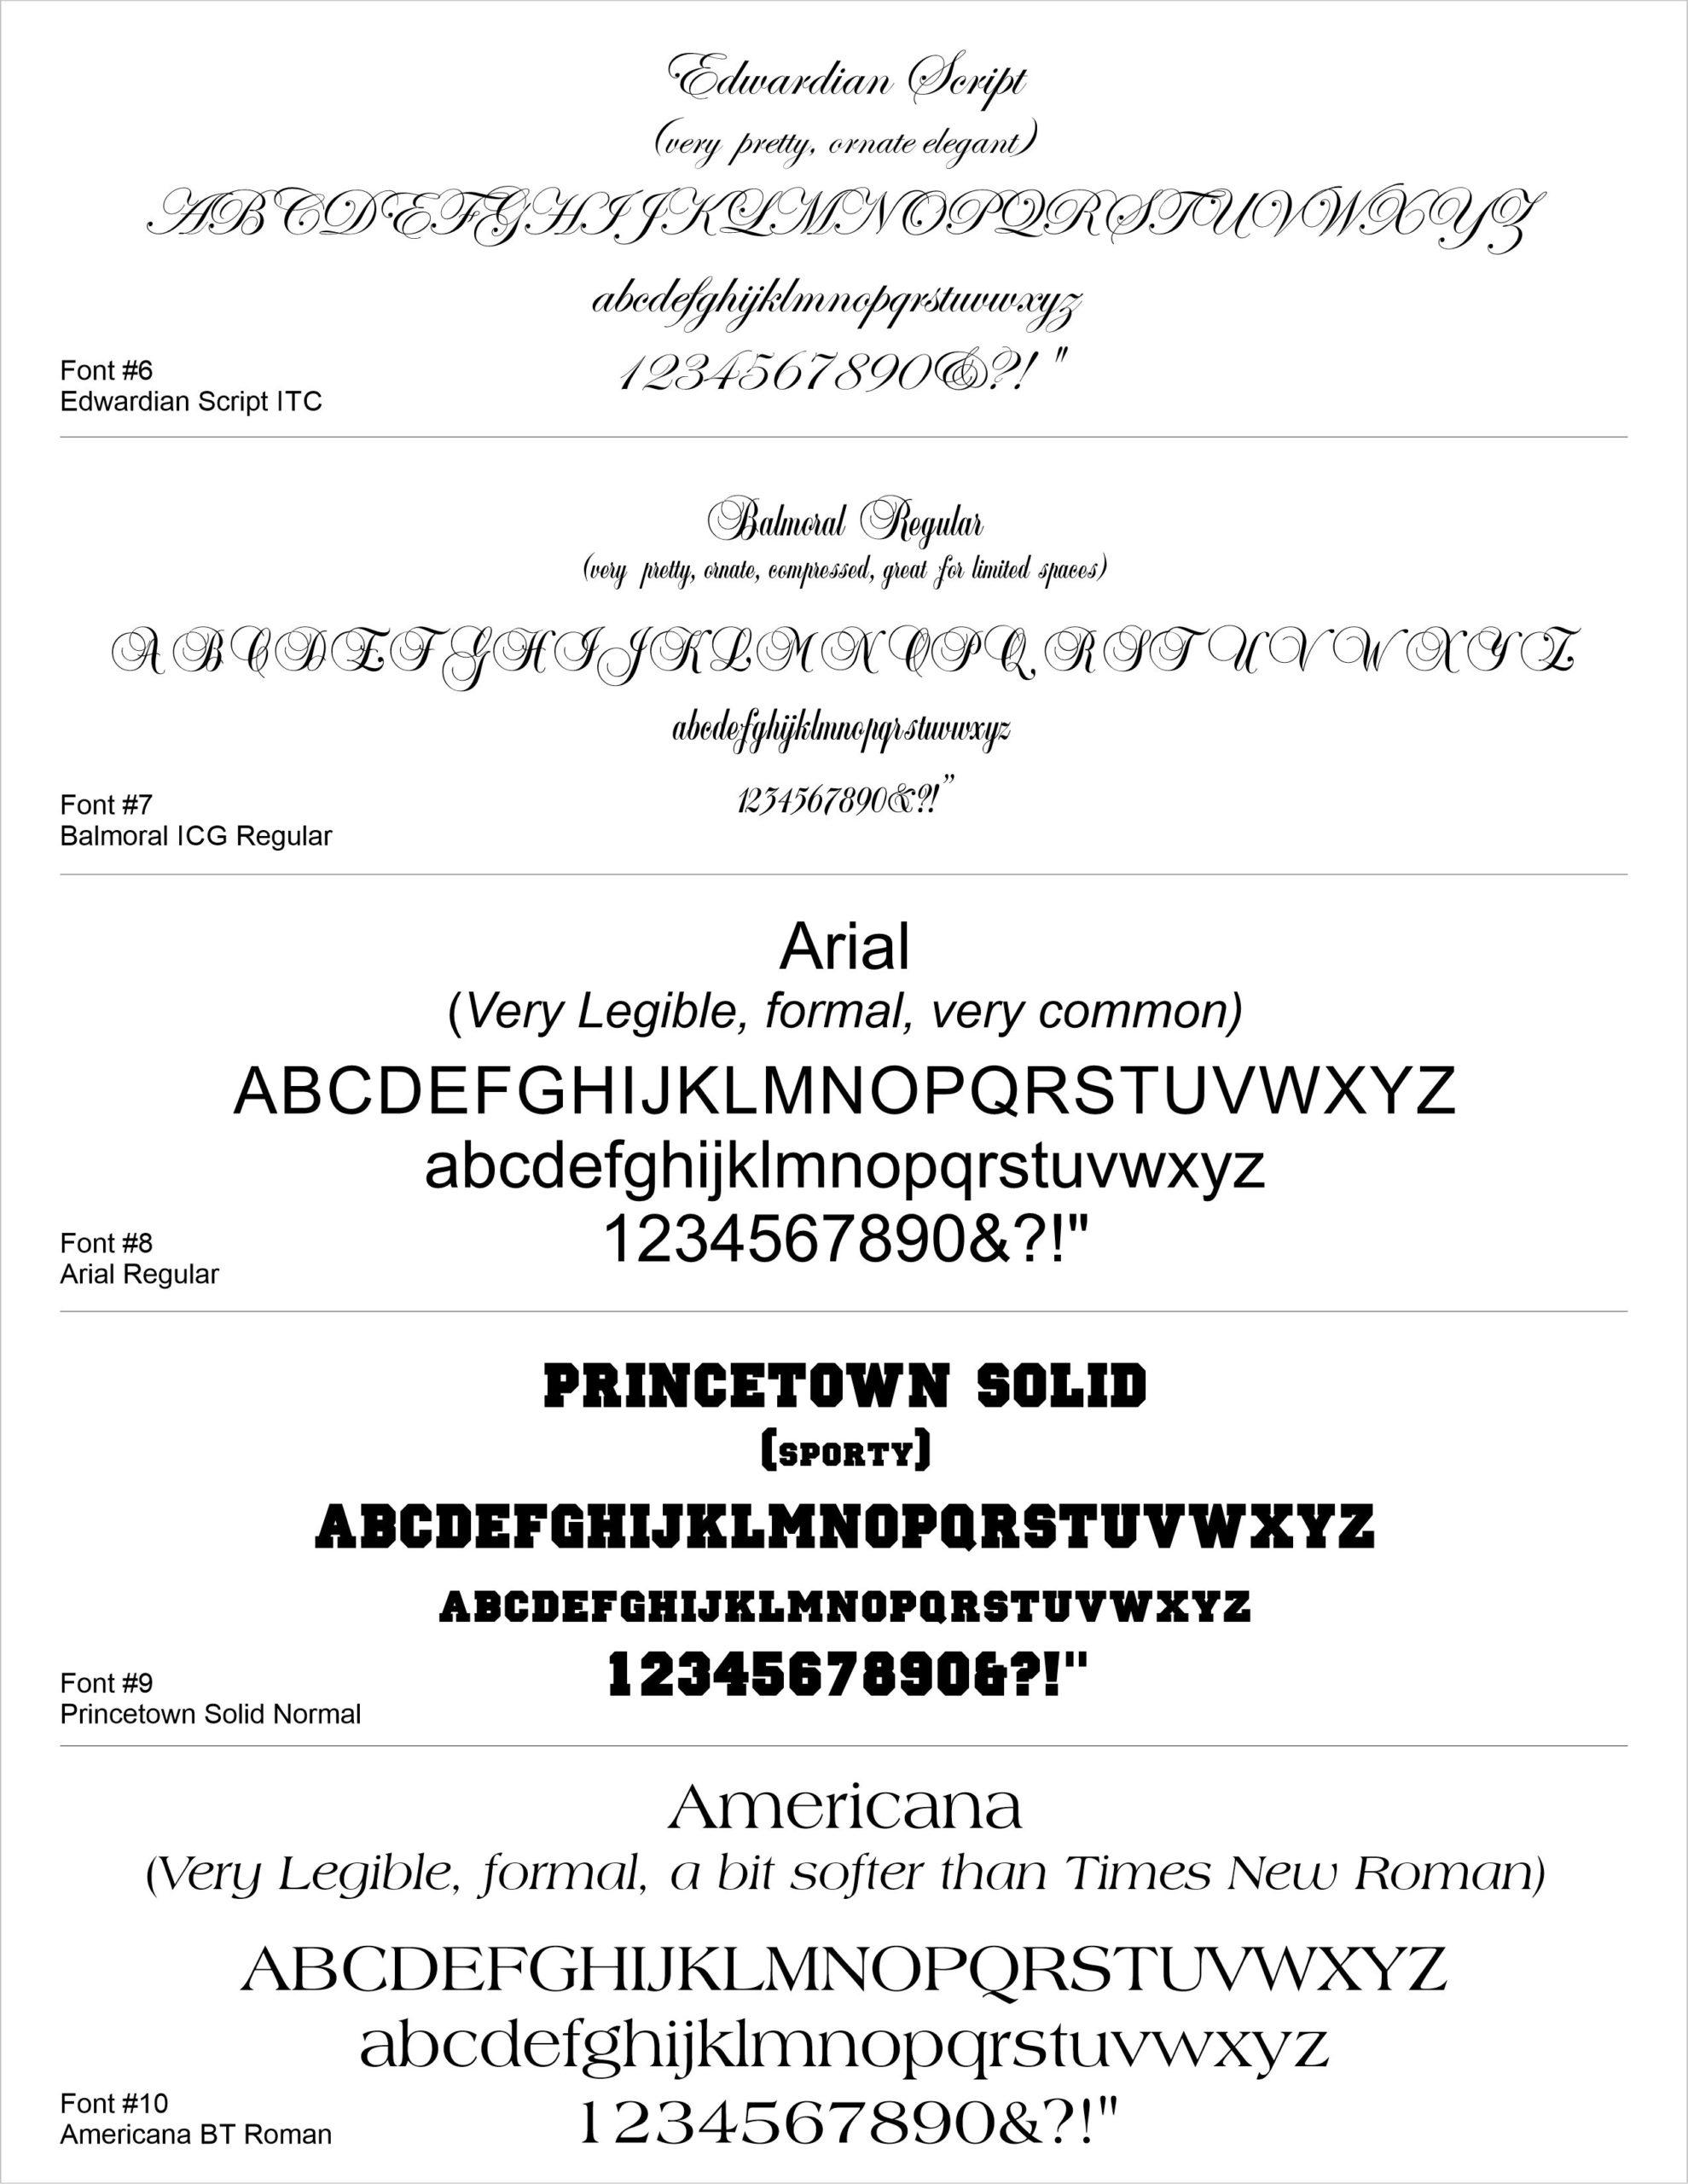 Download Font Ideas as a PDF